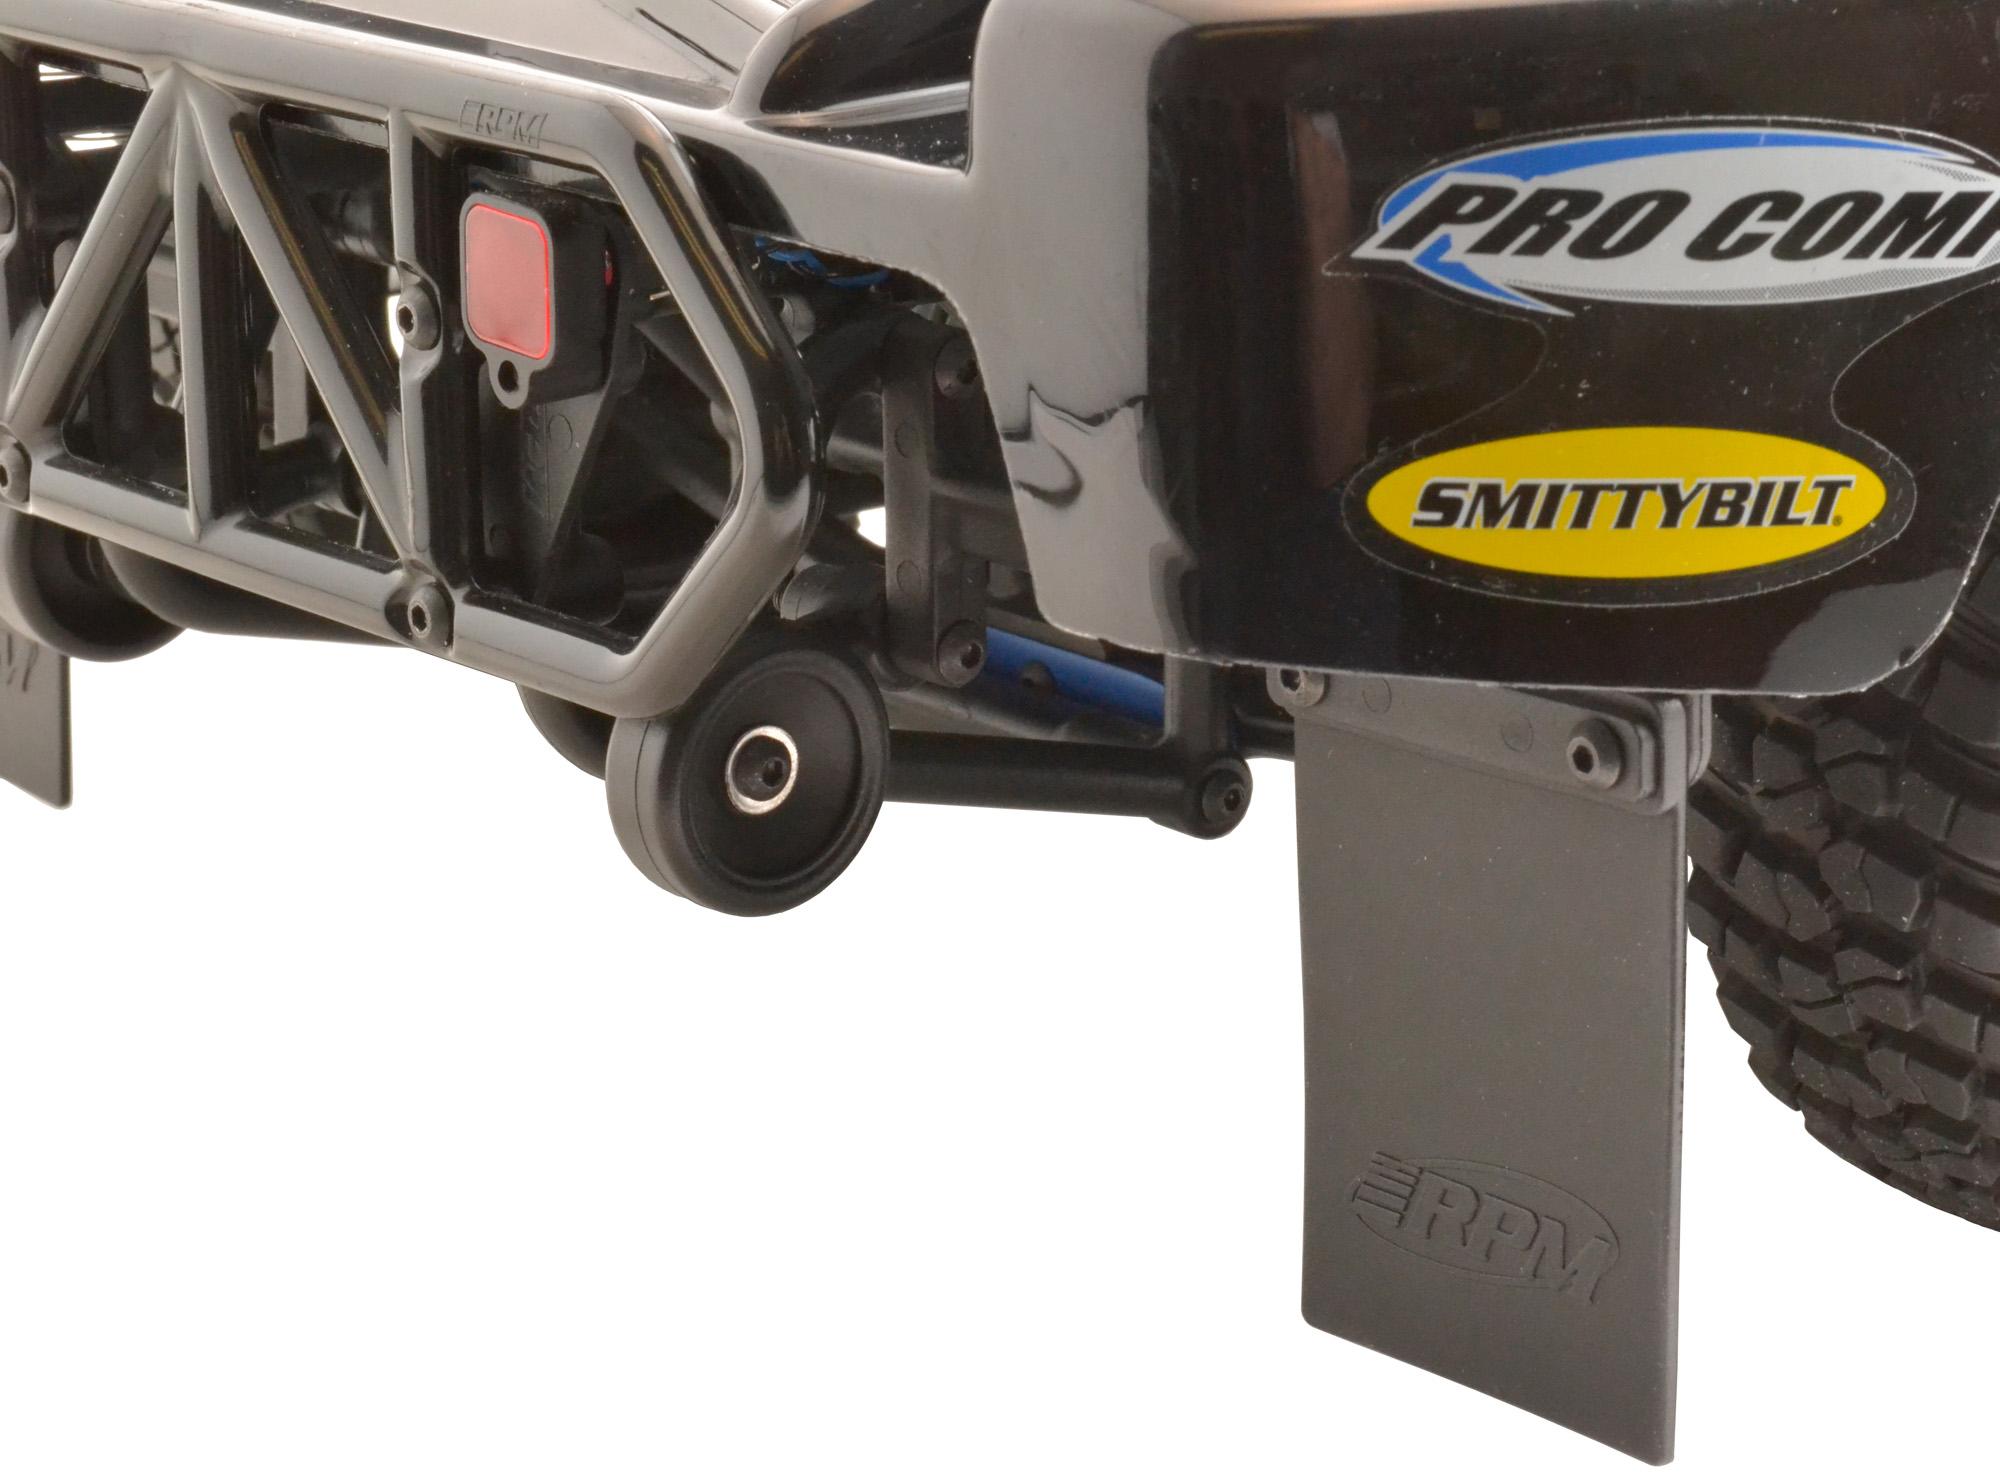 Low Visibility Wheelie Bars for the Slash 2wd, Slash 4×4